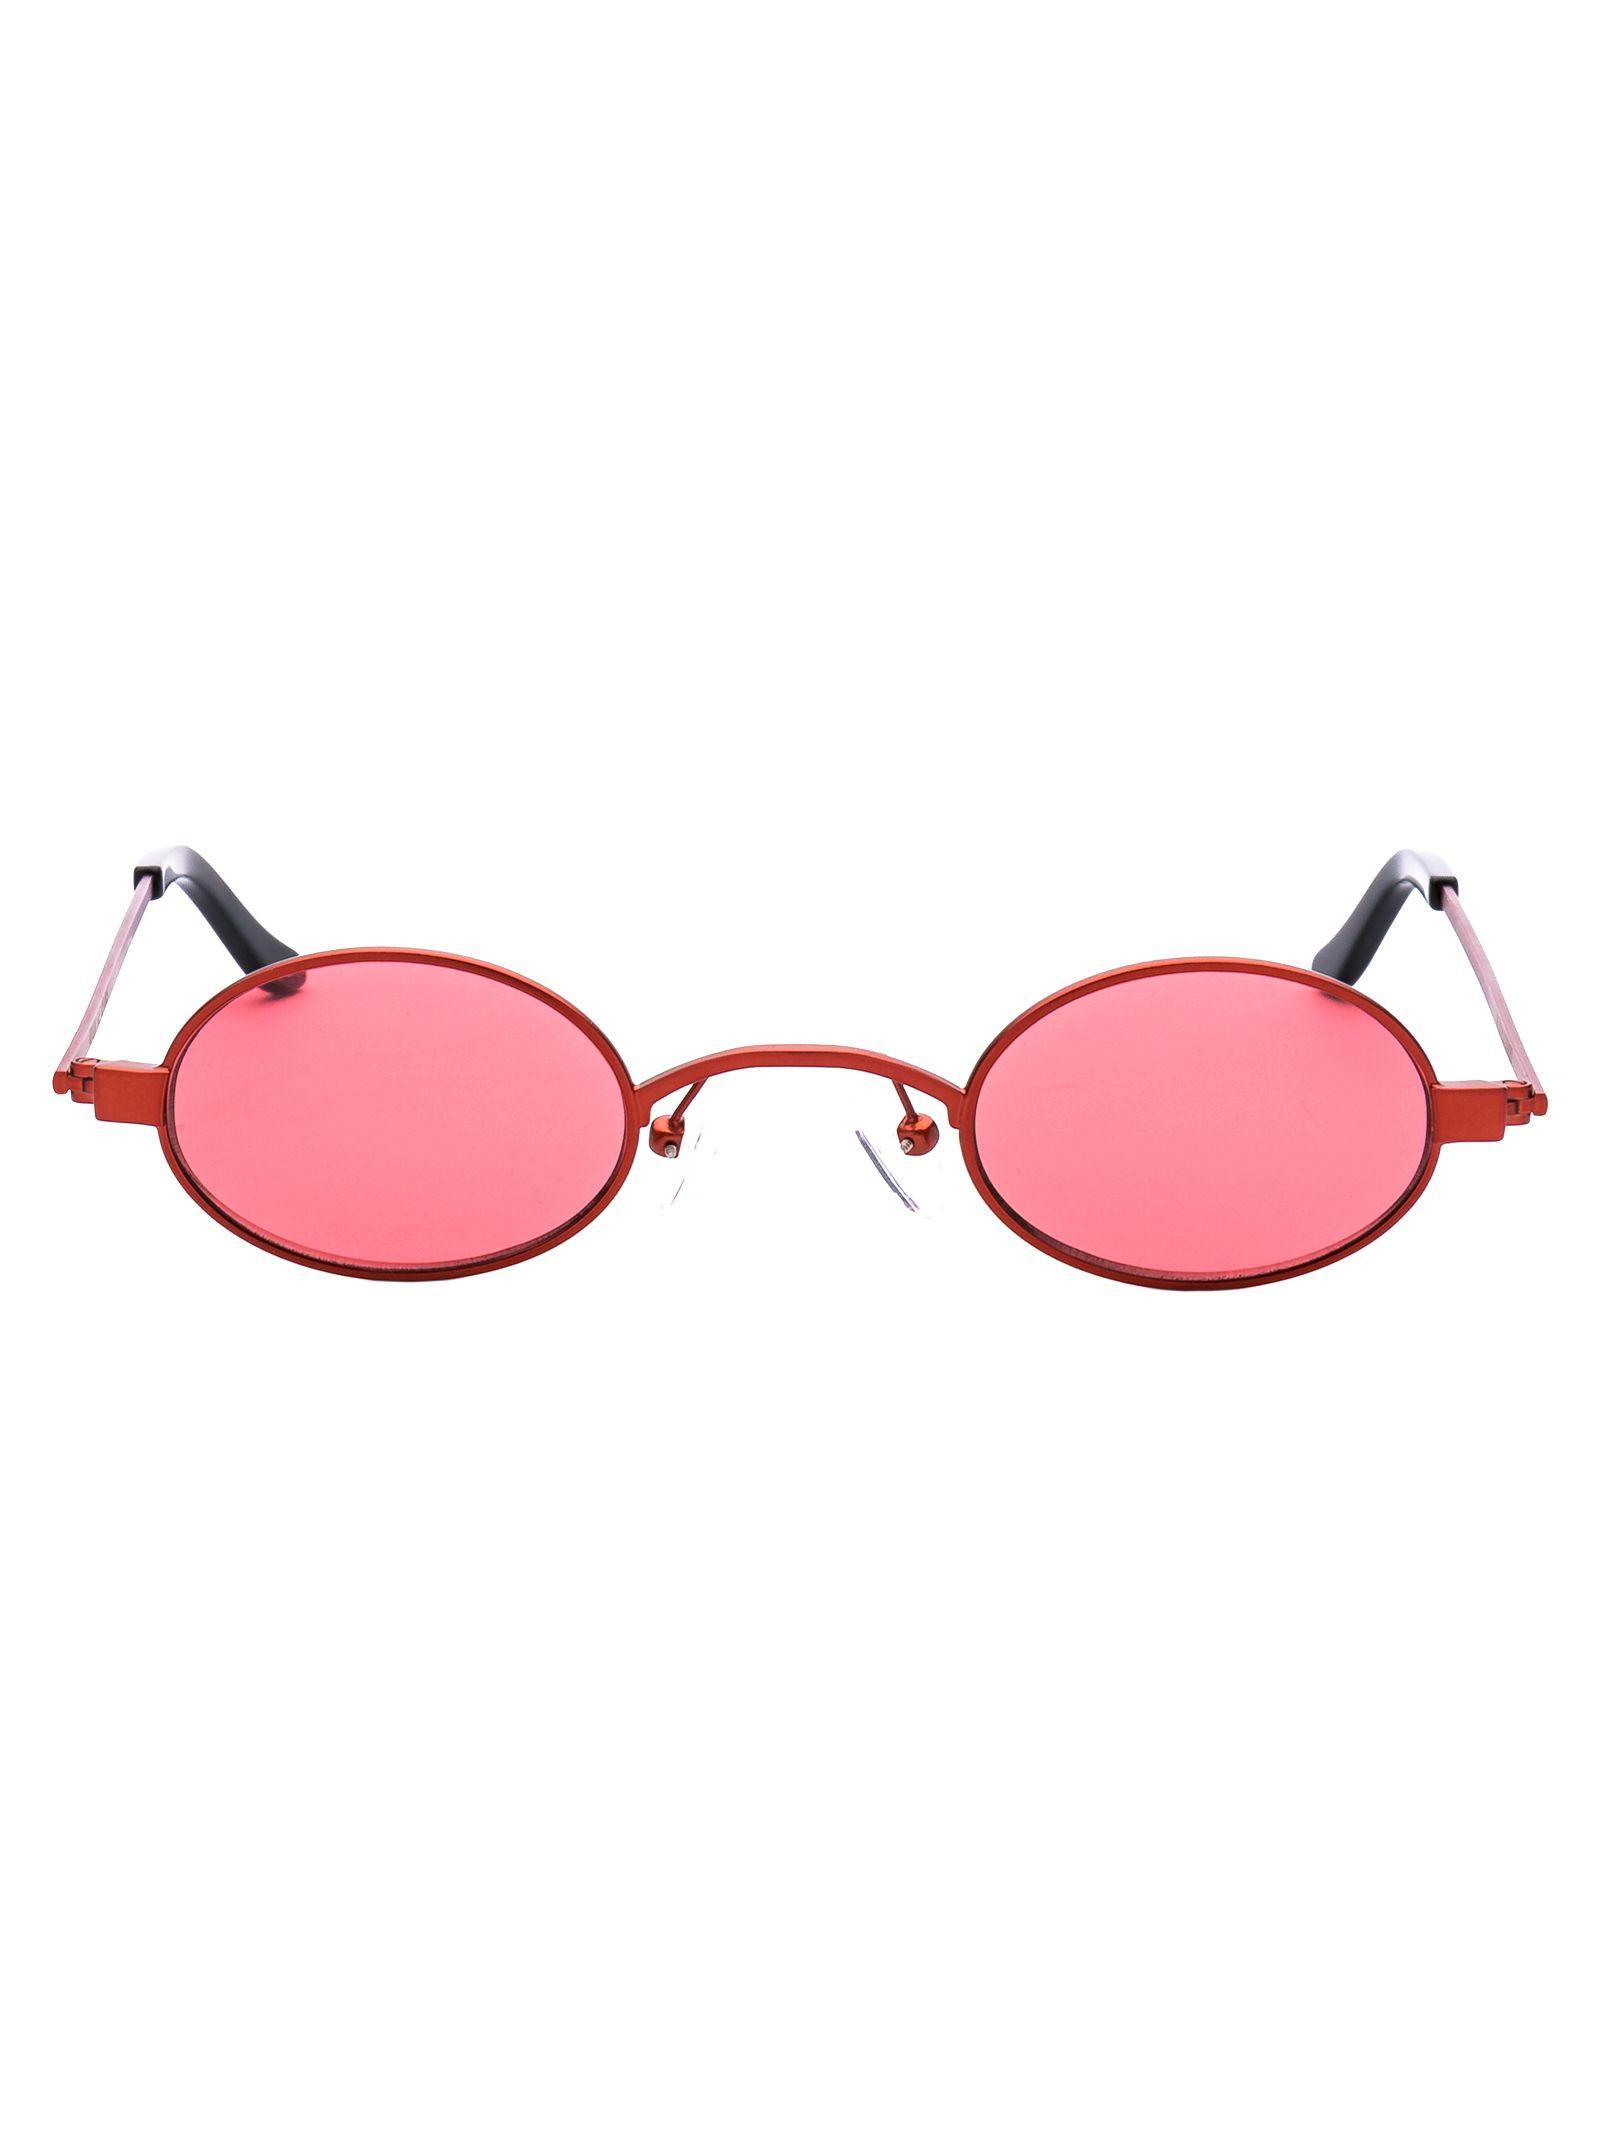 6882f8aa9e Roberi   Fraud Doris Sunglasses In Red